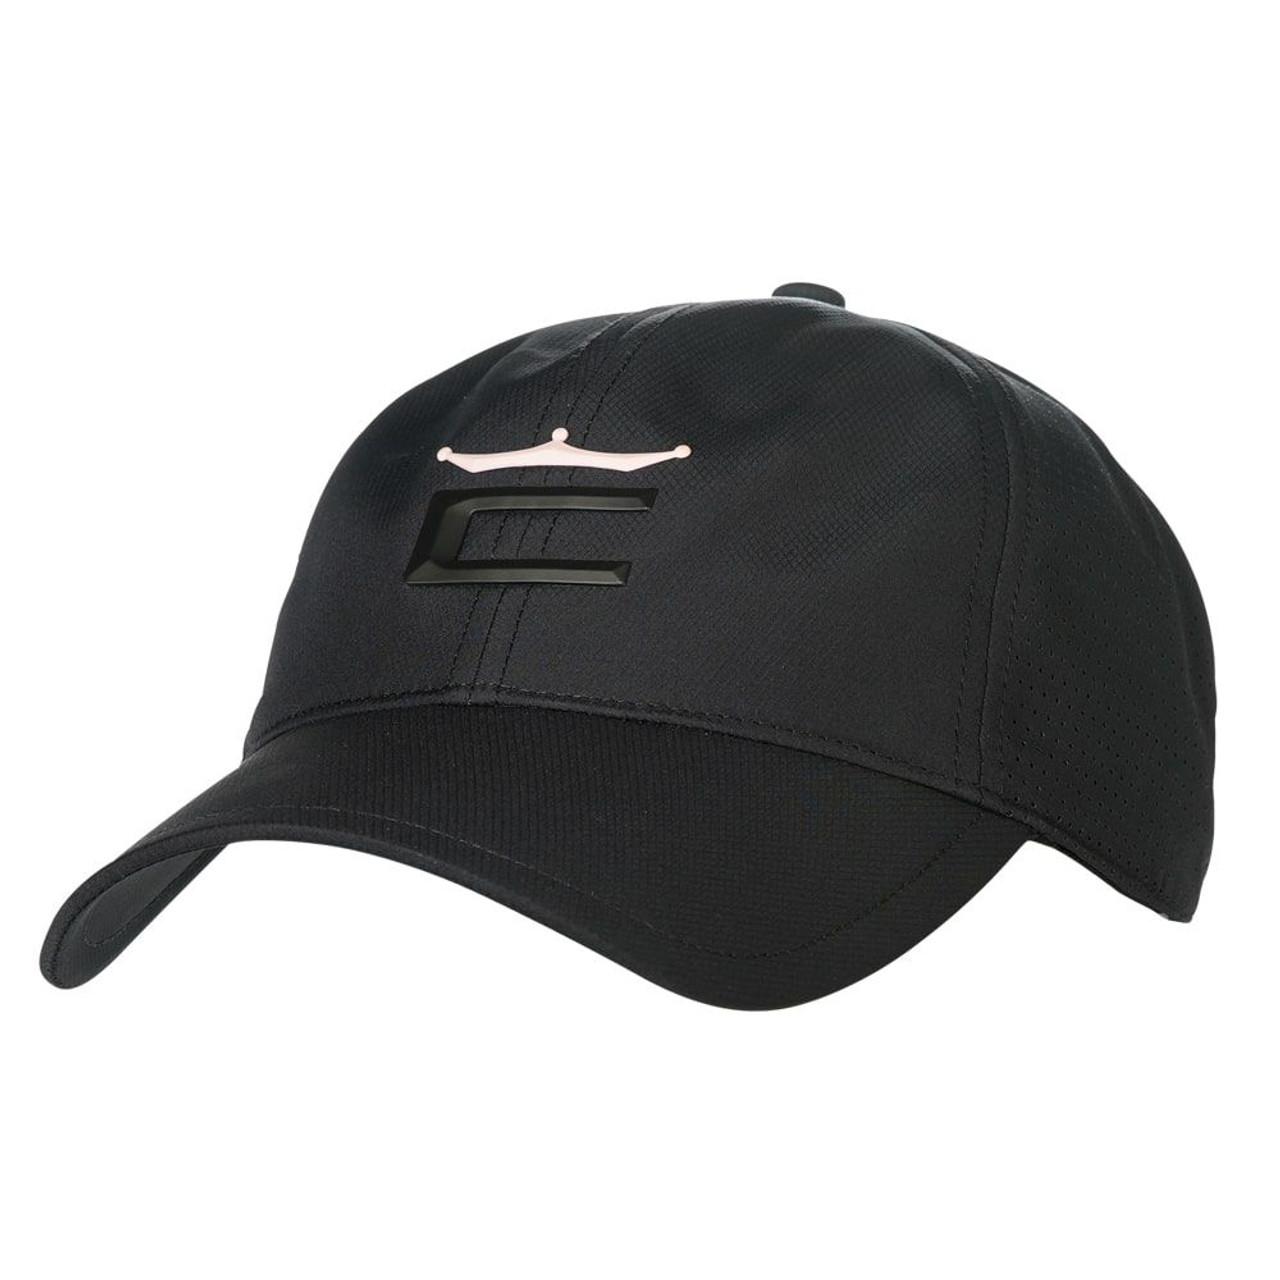 Cobra Women Crown Adjustable Golf Cap - Black